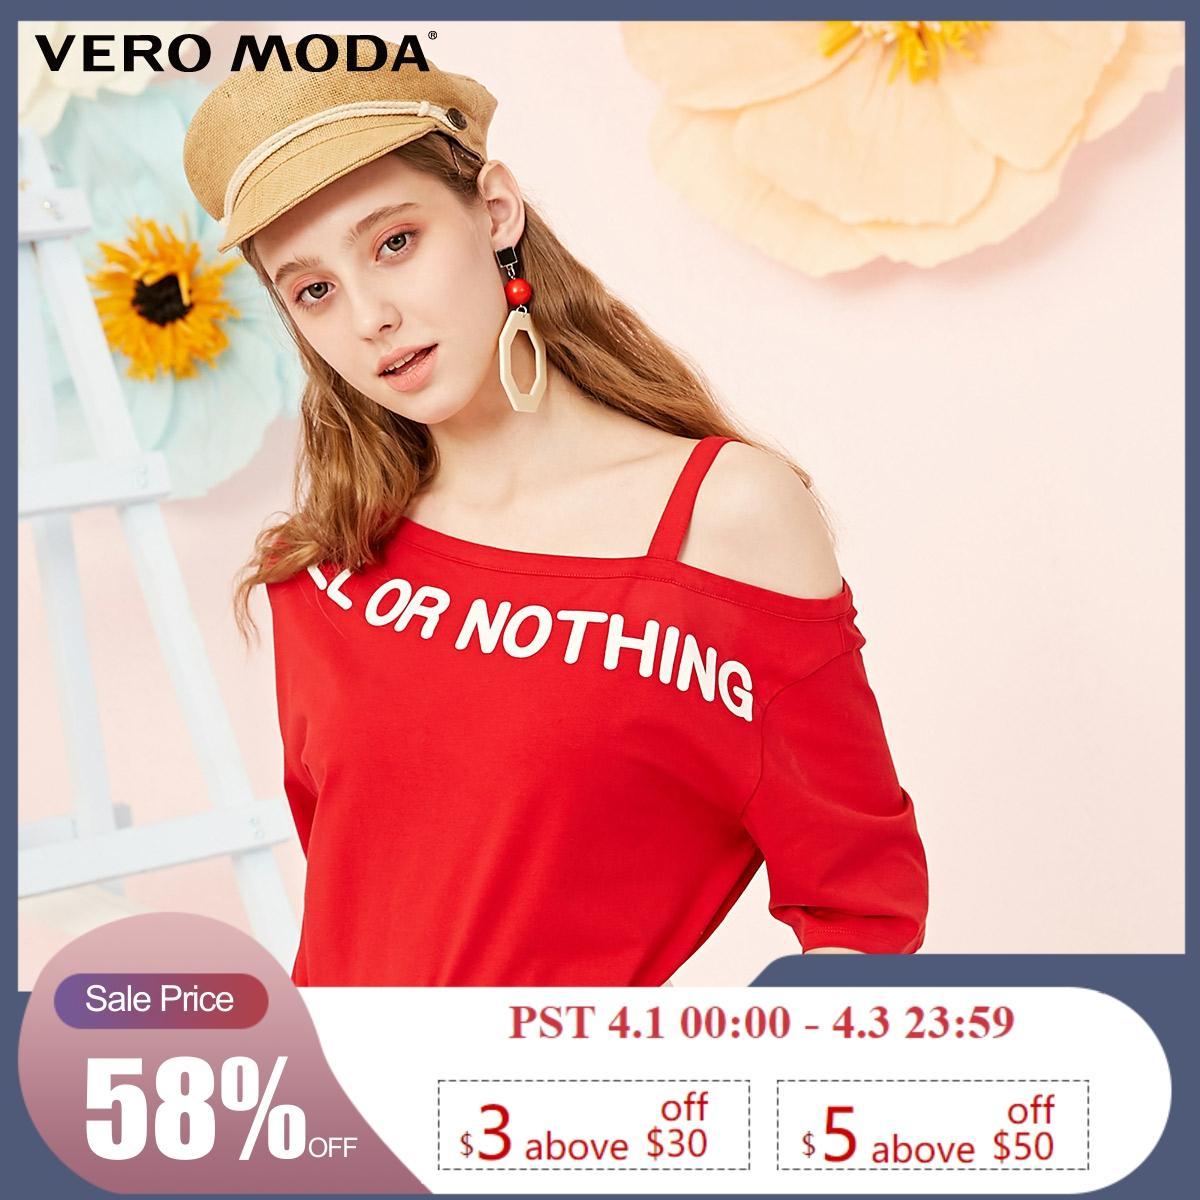 Vero Moda New Women's Asymmetrical Diagonal Print Short-sleevs T-shirt | 3191T1504